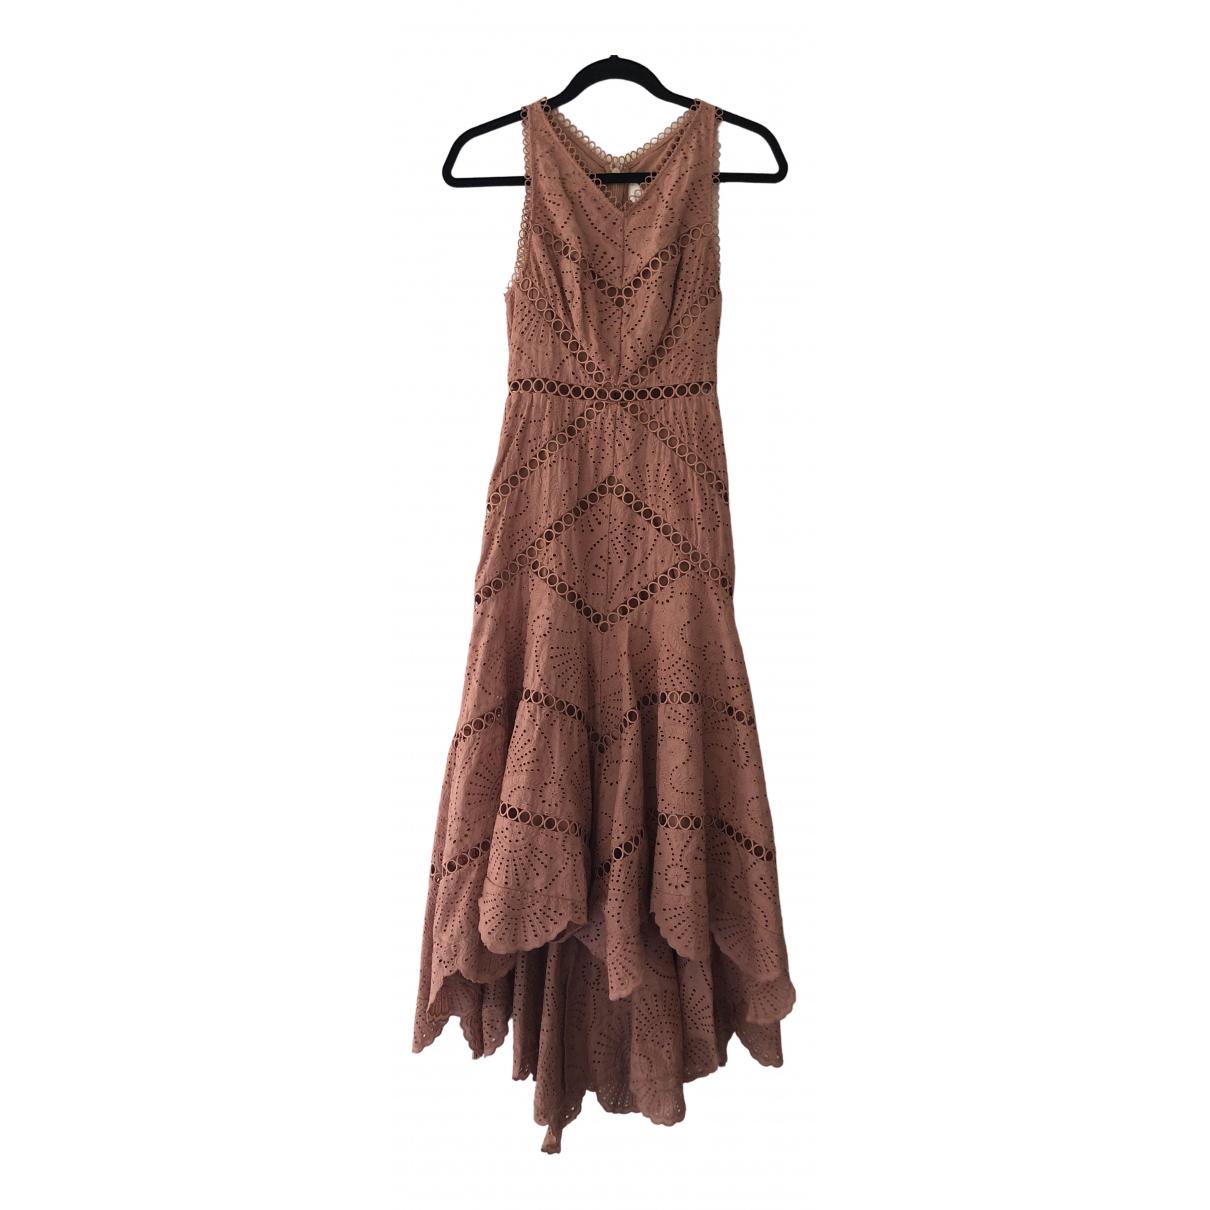 Zimmermann \N Pink Cotton dress for Women 0 0-5